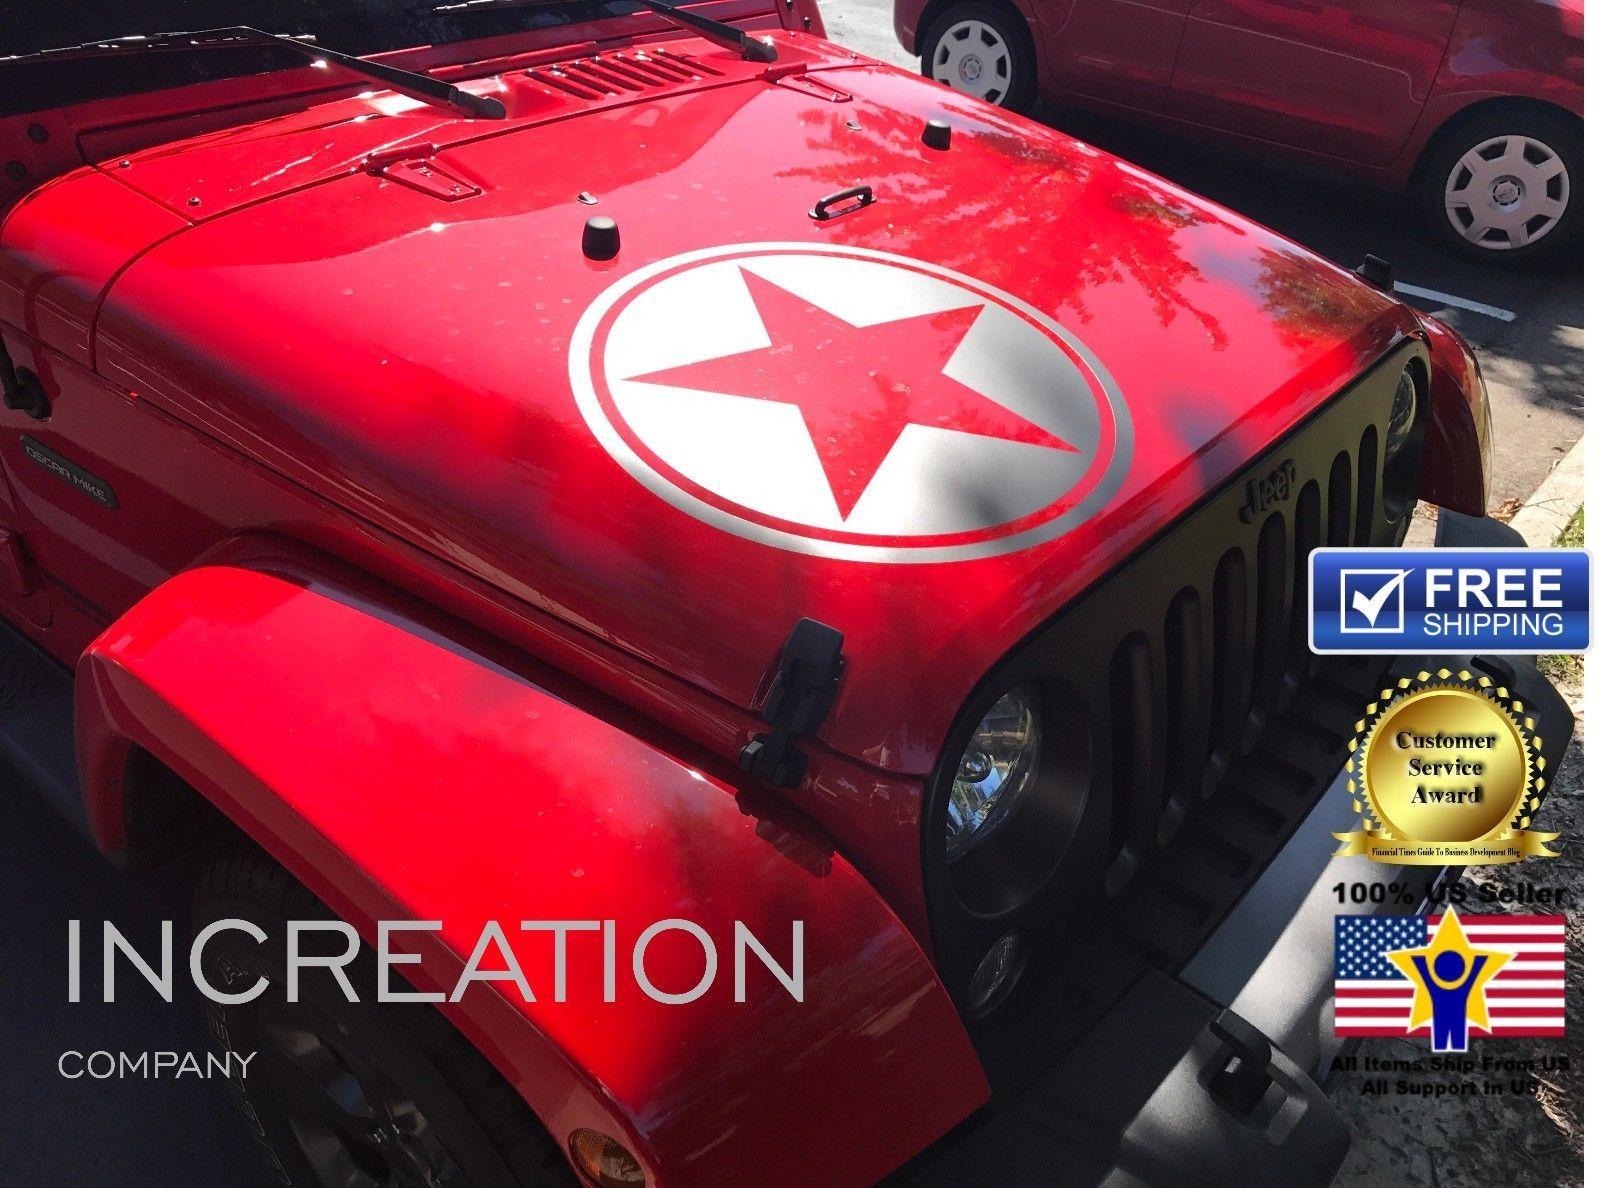 Truck Car Jeep Wrangler 4x4 vinyl decal, racing sticker art hood star Graphics